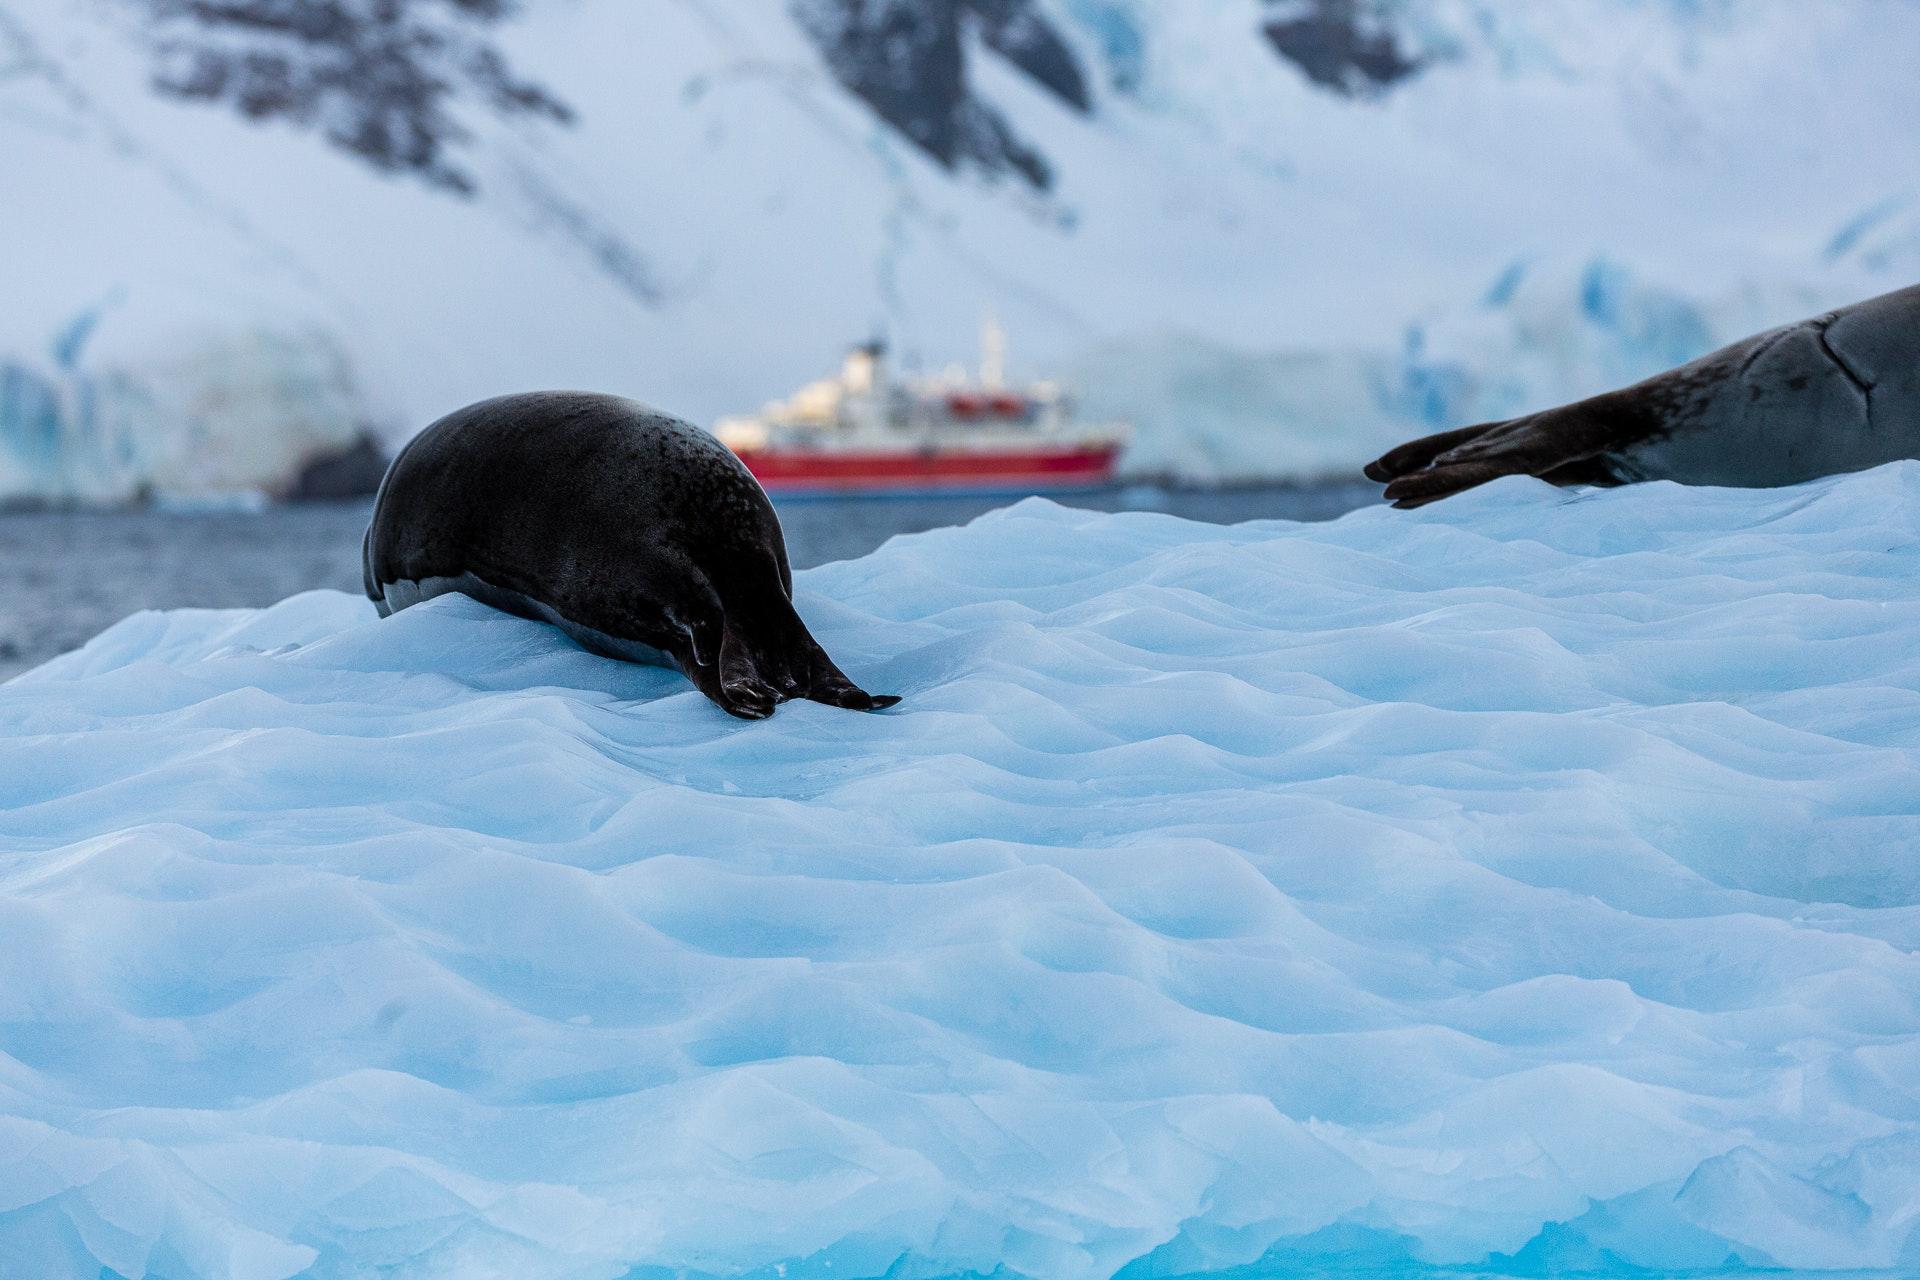 Crabeater Seal